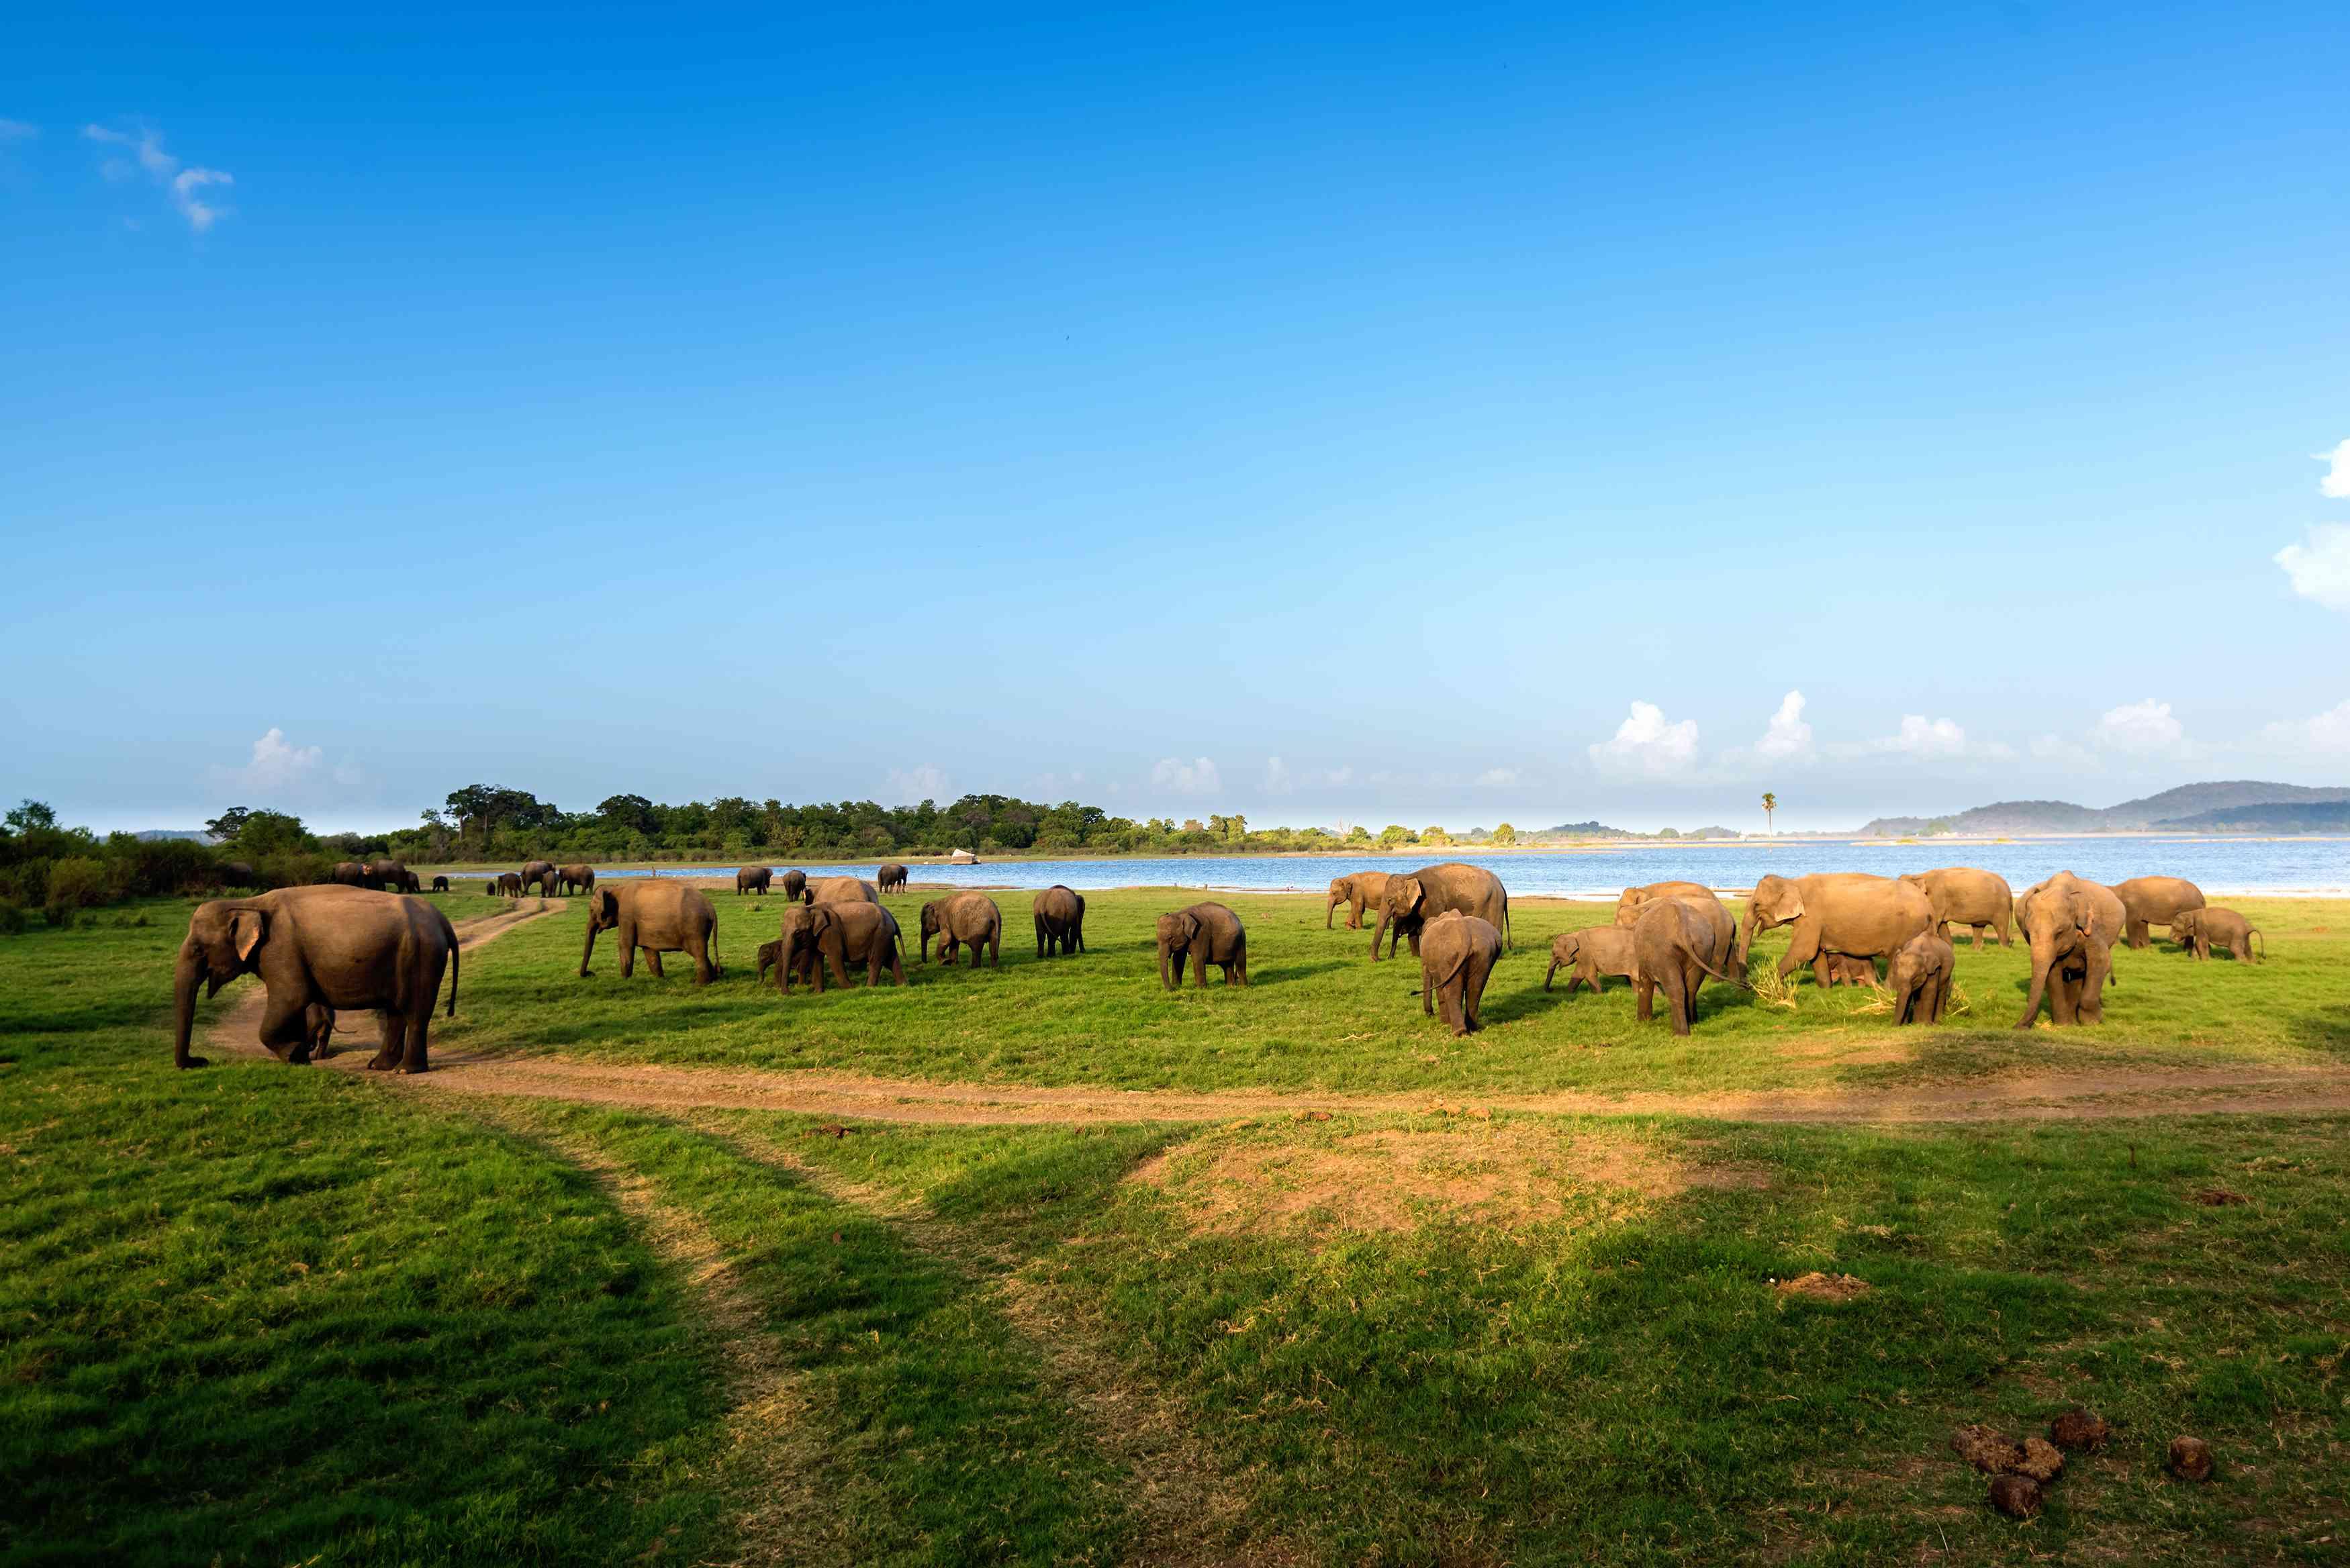 Wild elephants spotted during safari in Sri Lanka